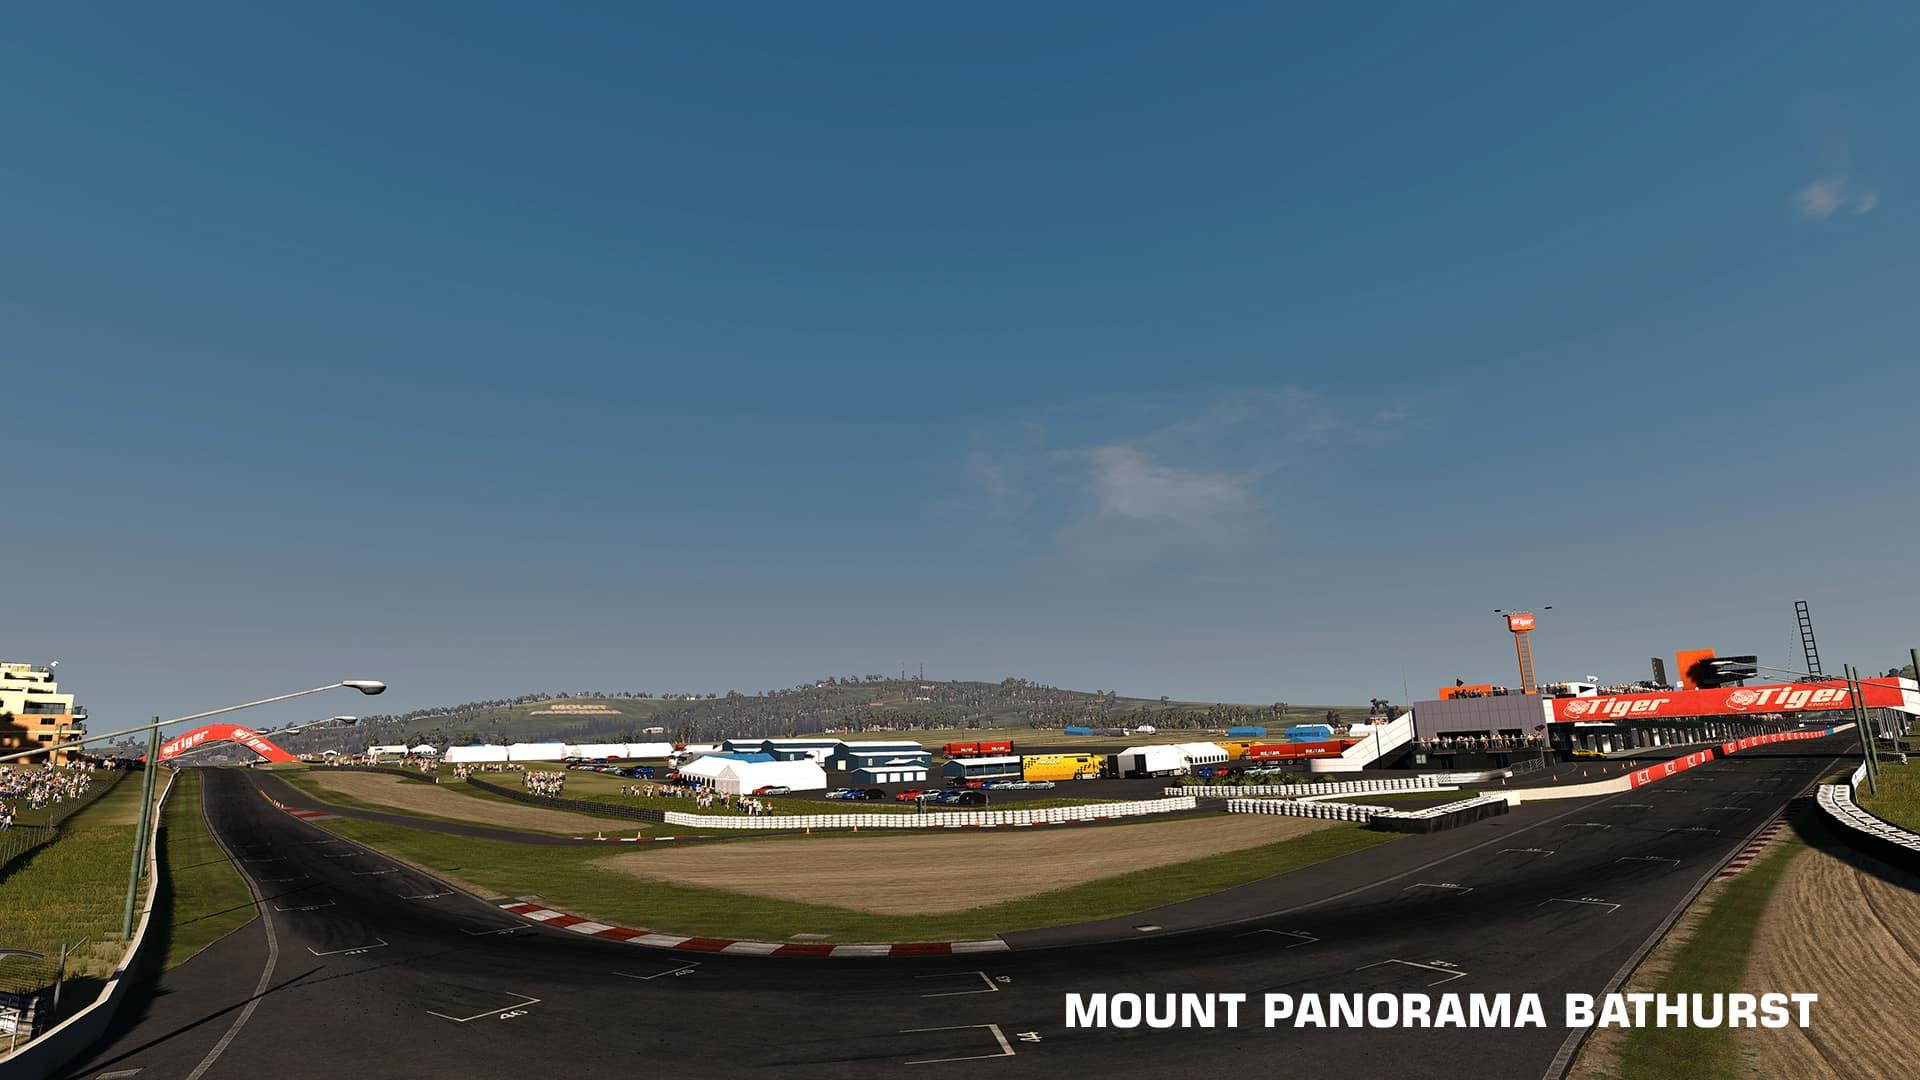 project-cars-mount-panorama-bathurst-track